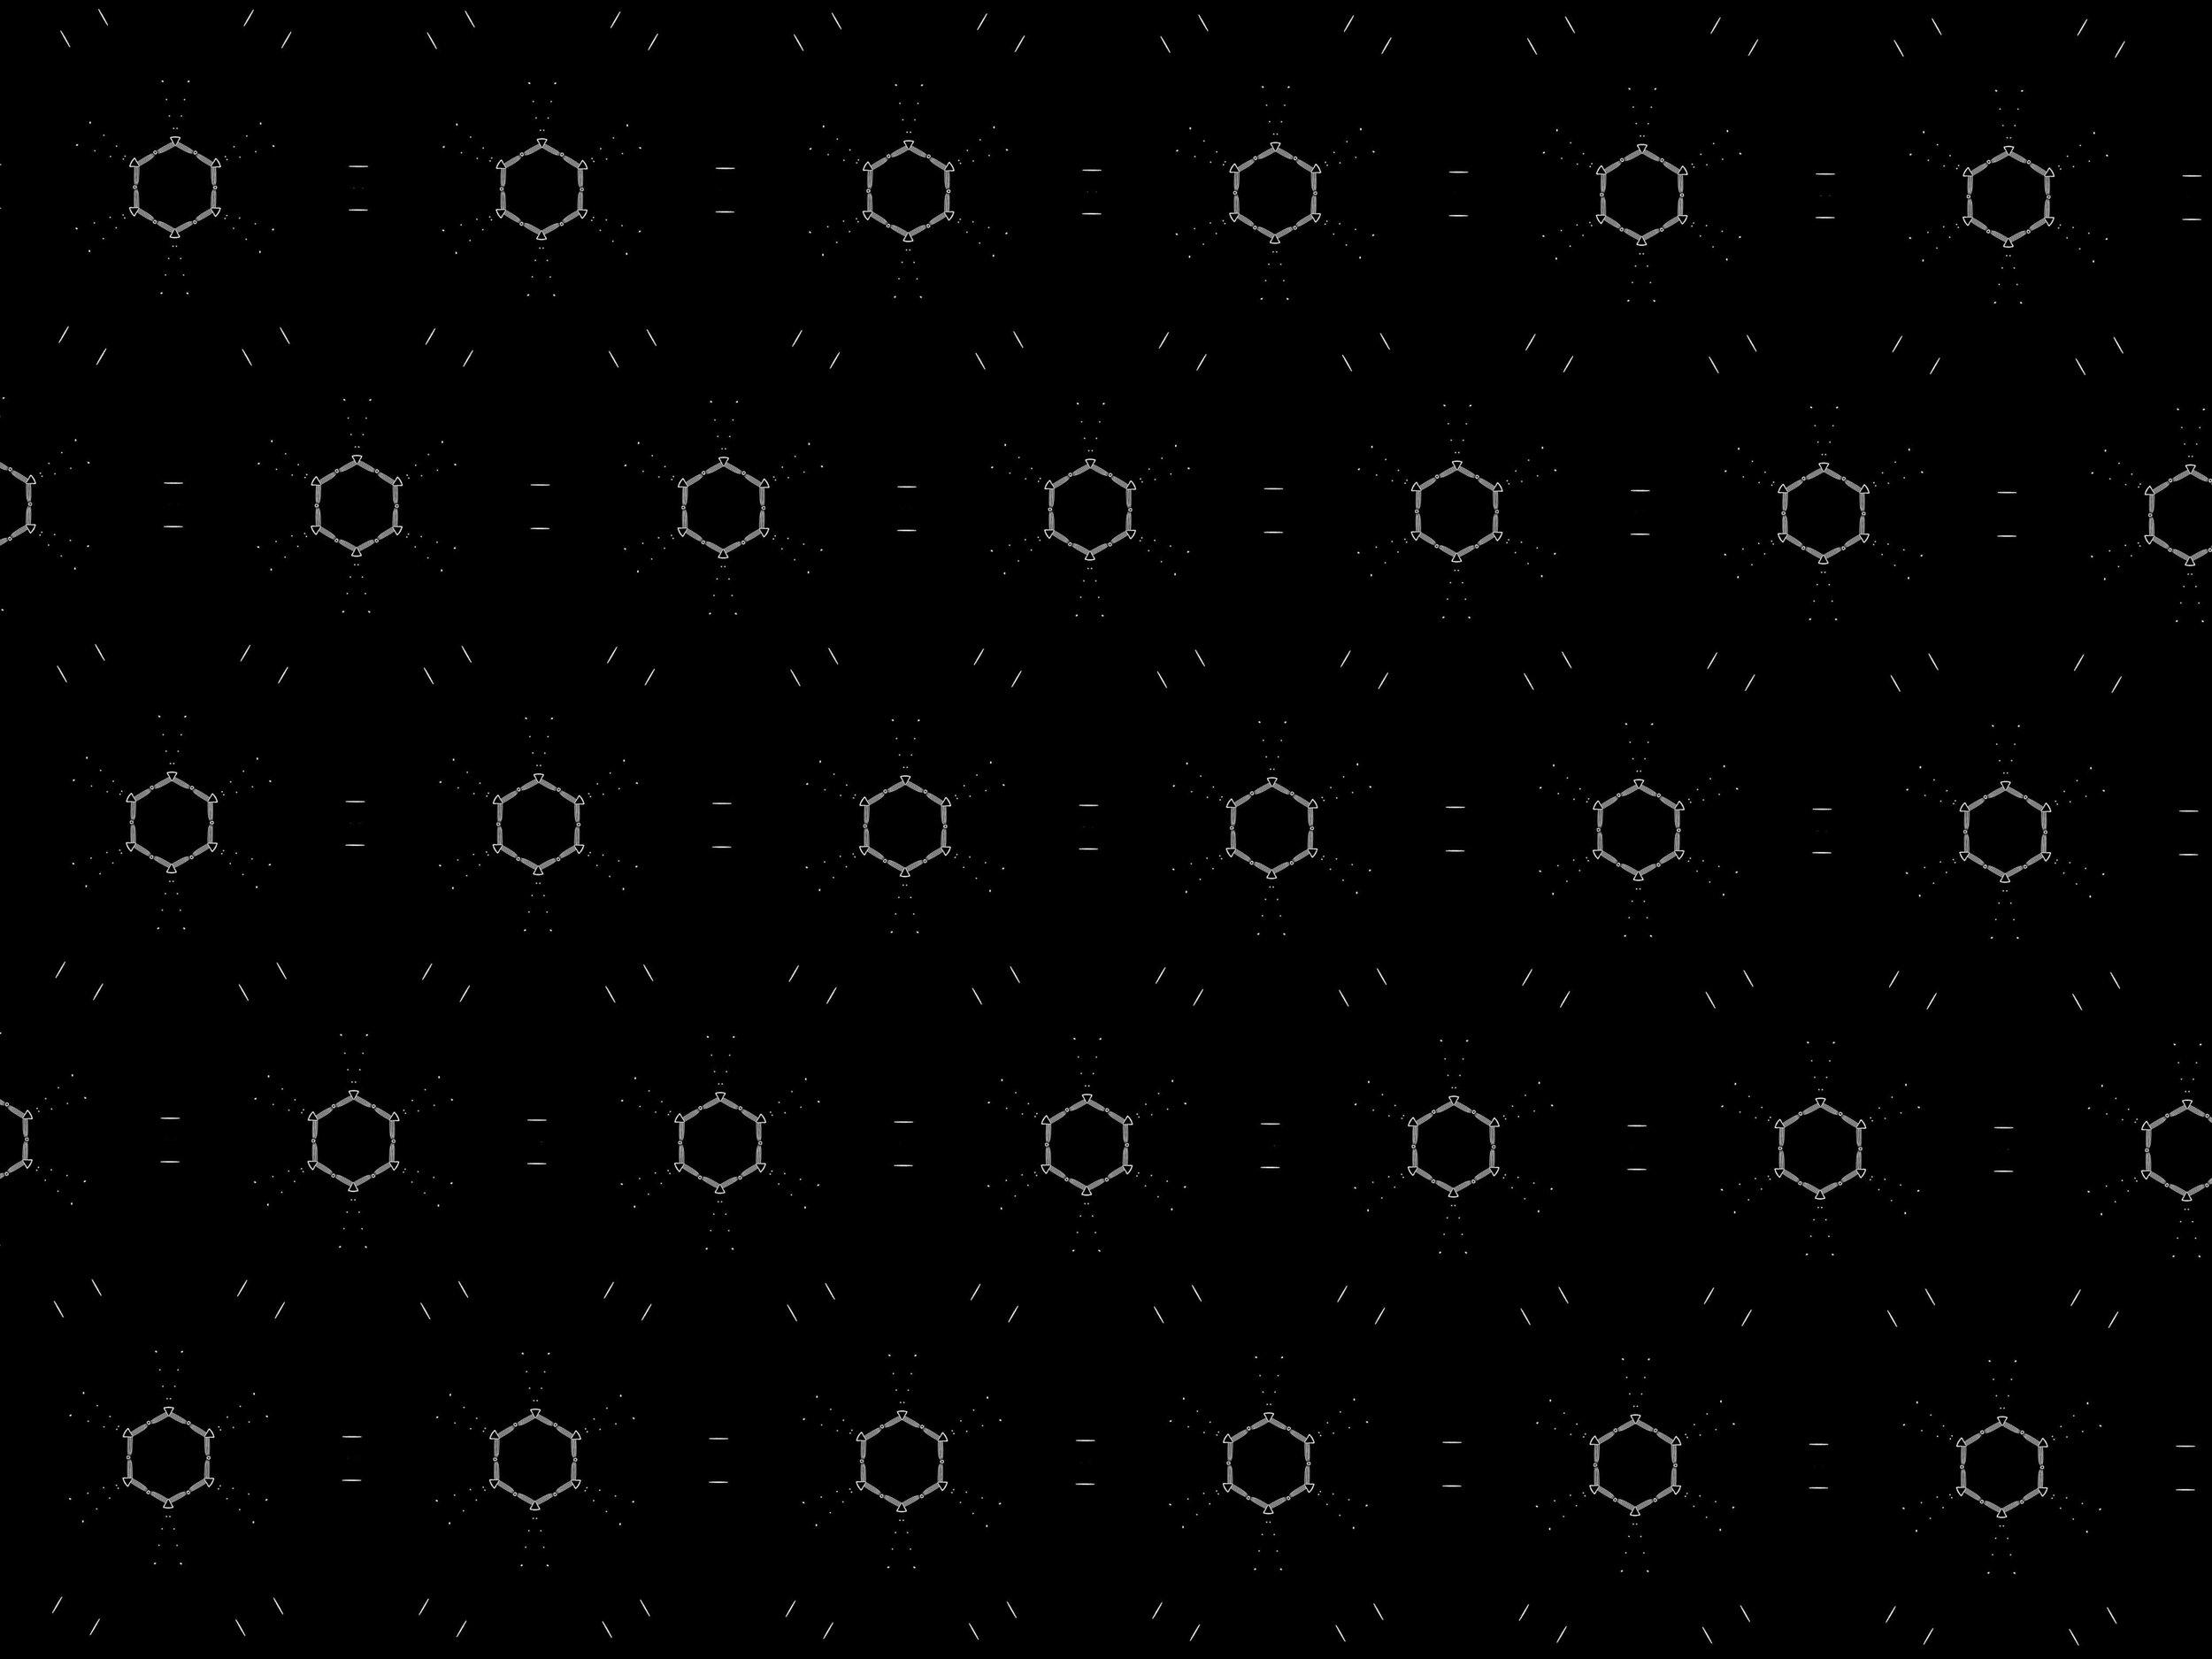 OLED_wallpaper_2_rmrdnl.jpg